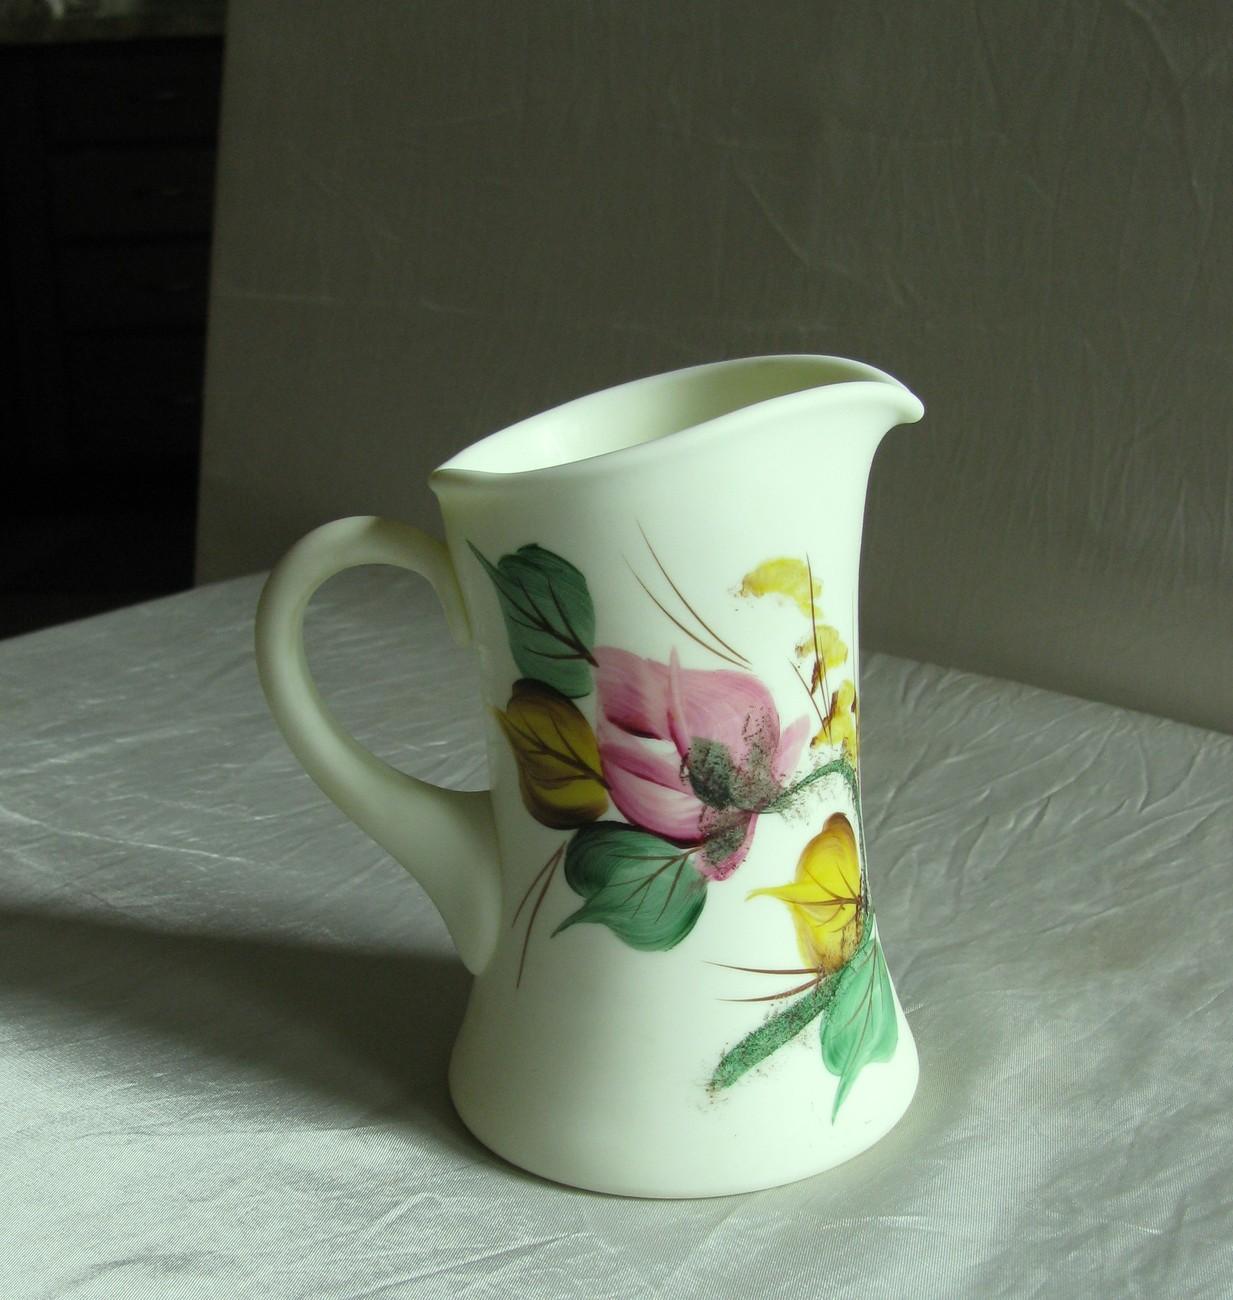 Lgw mroses pitcher1